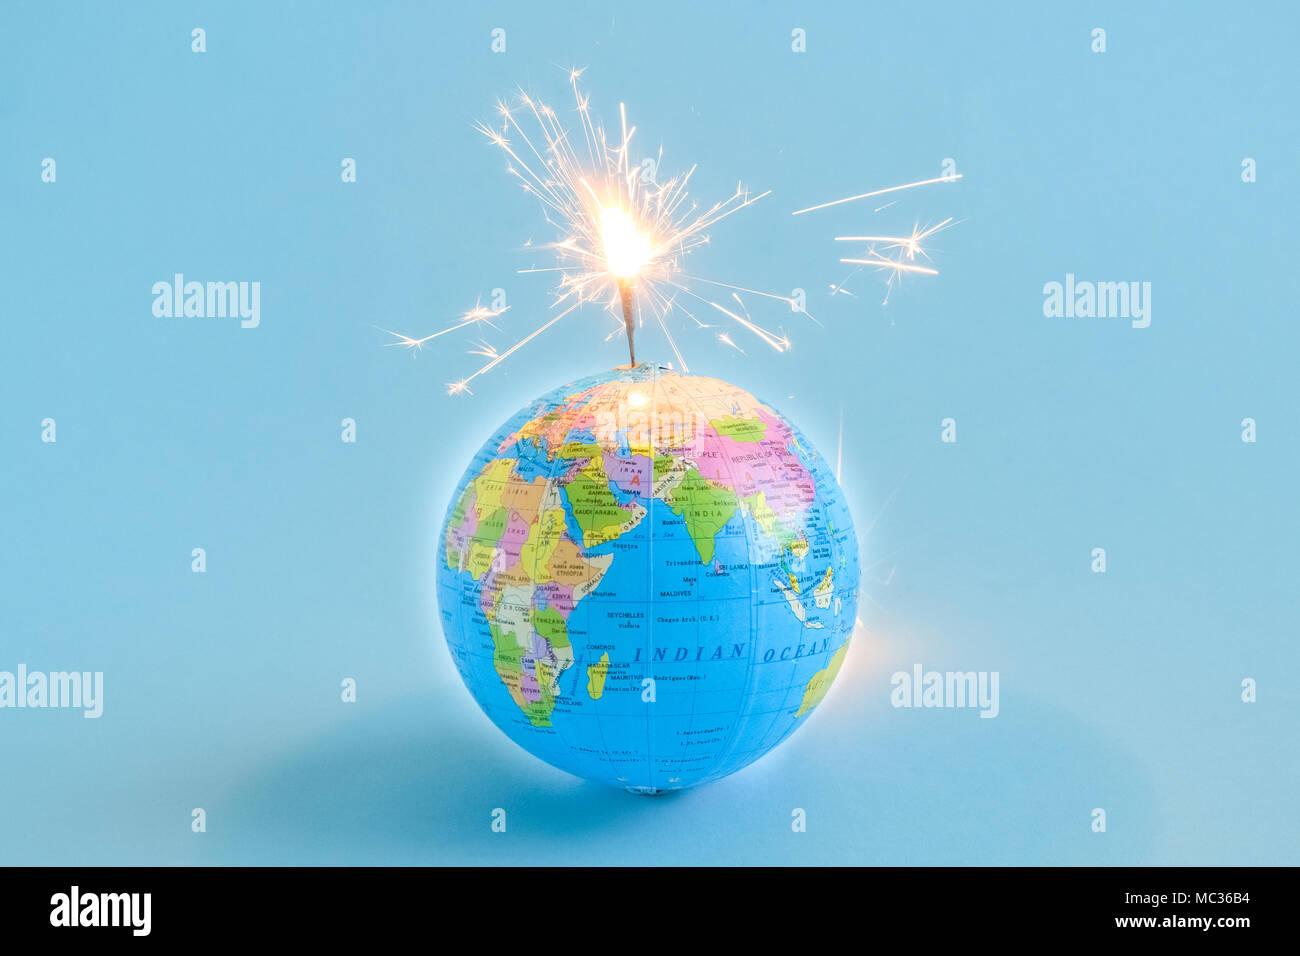 Globus Granate auf Blau minimal kreatives Konzept isoliert Stockbild